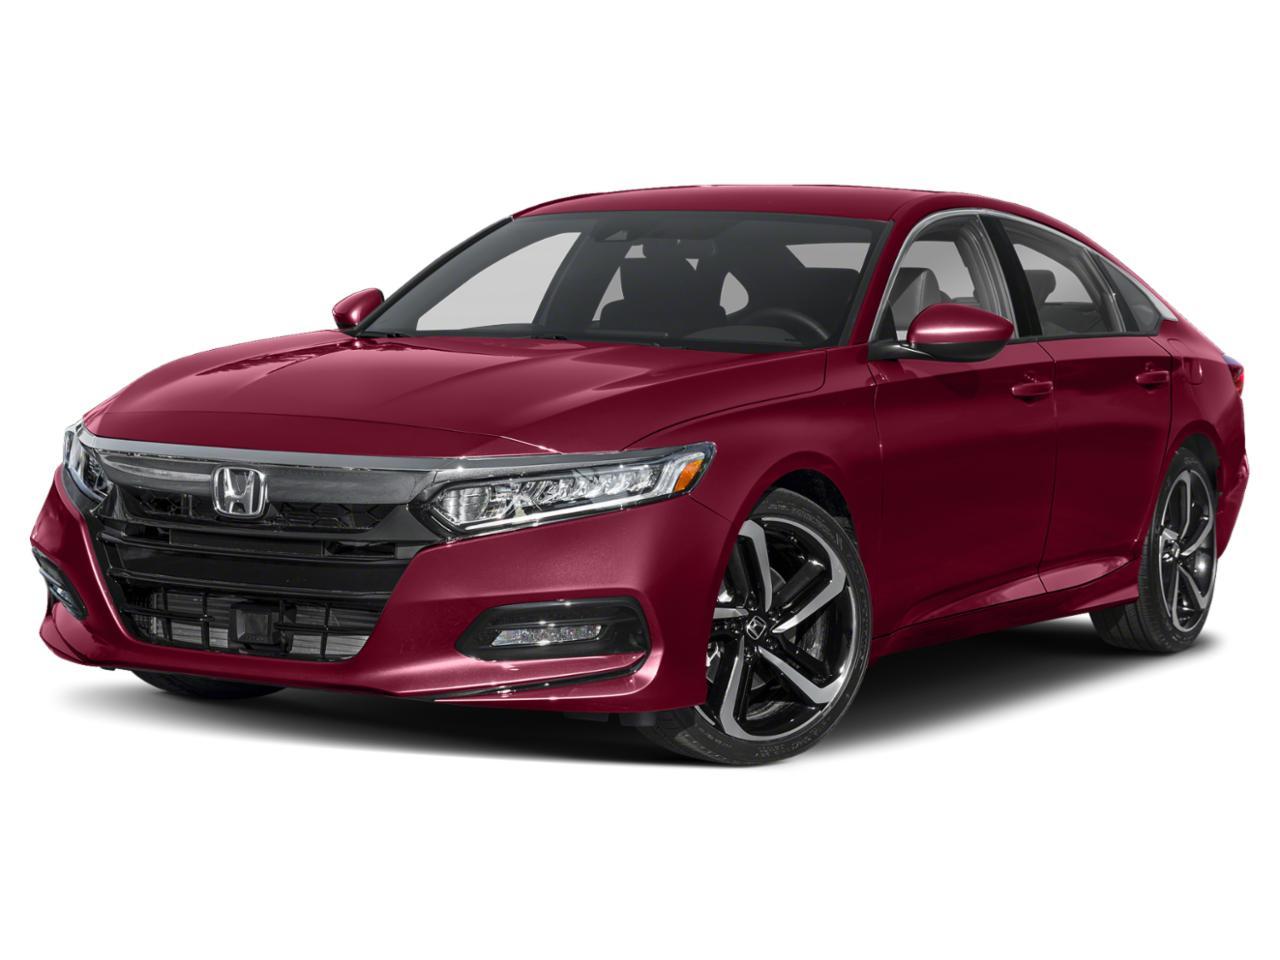 2019 Honda Accord Sedan Vehicle Photo in Pittsburgh, PA 15226